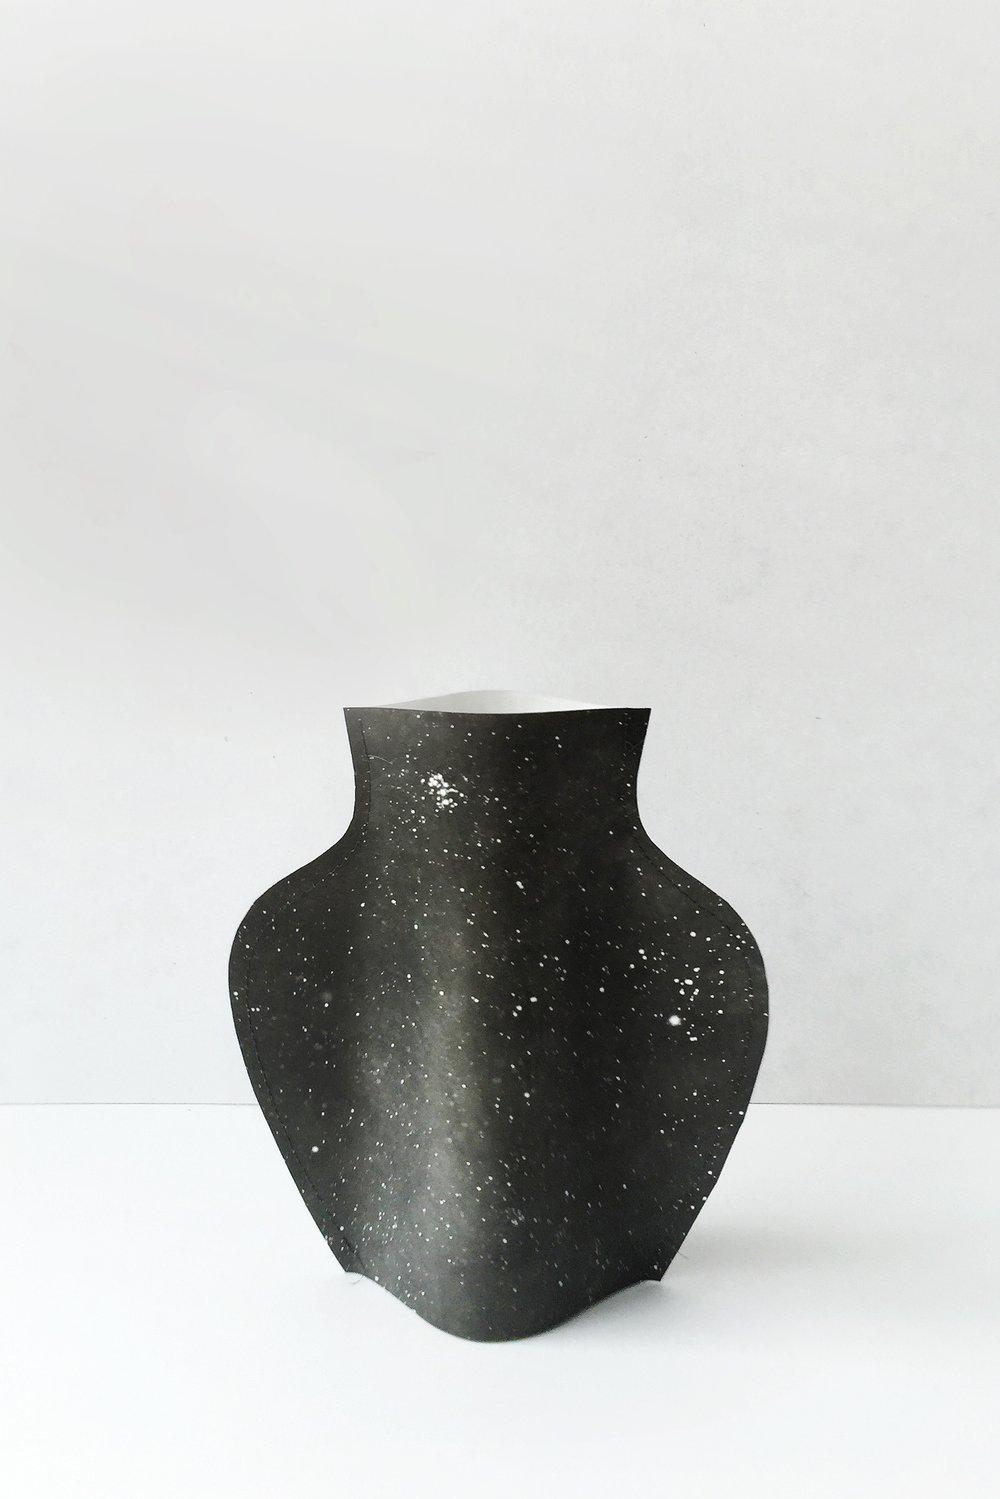 Image of Popup vase - Constellation